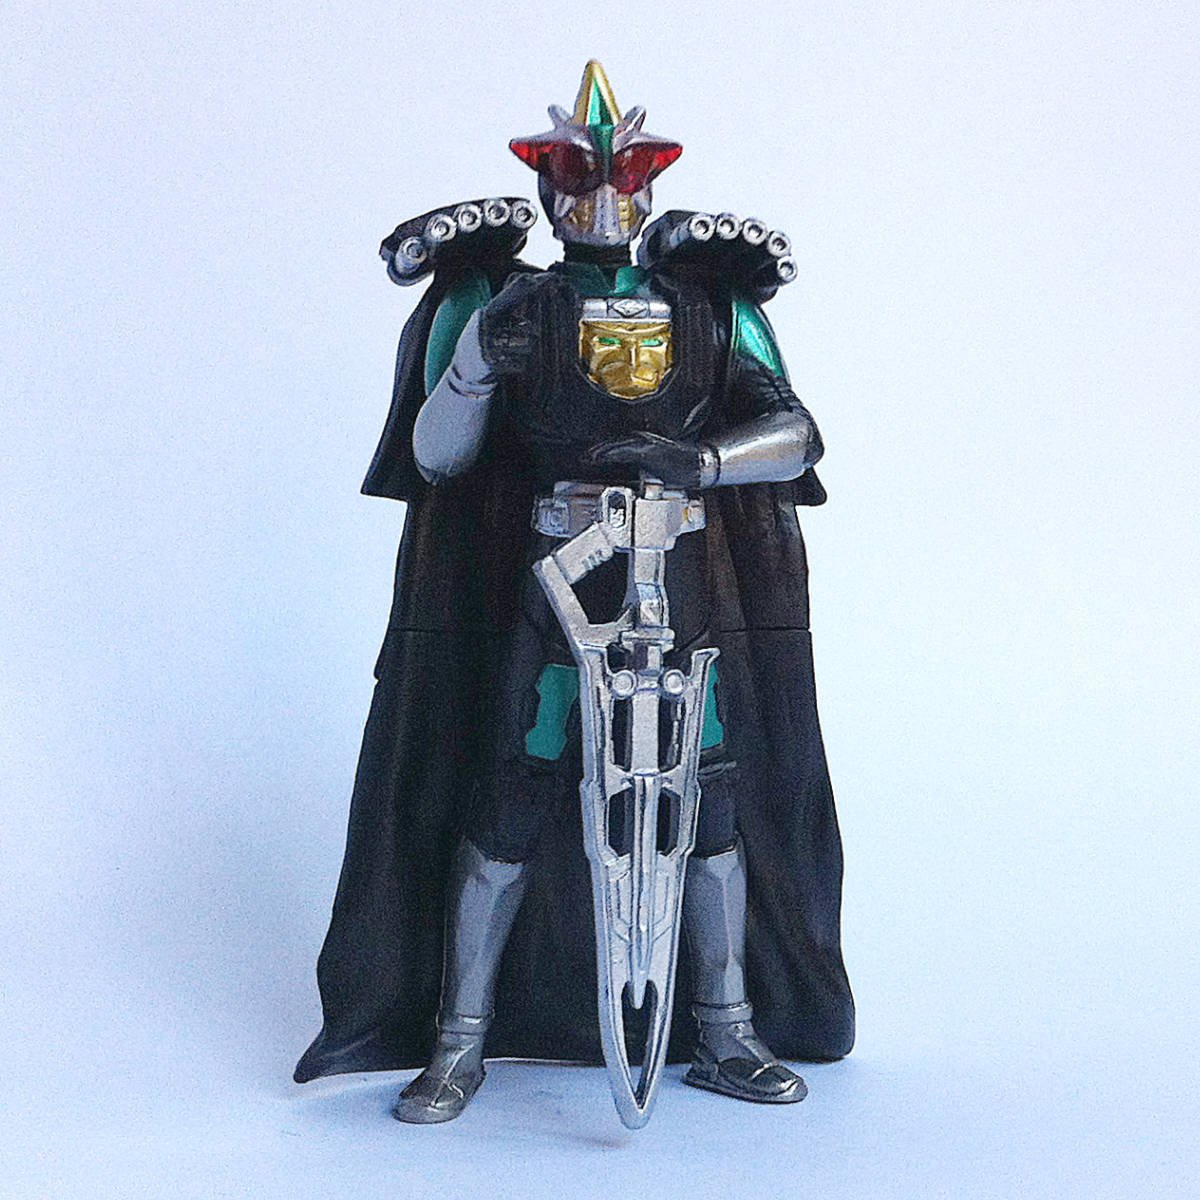 Kamen Rider Zeronos Vega Form from HG Kamen Rider by Bandai